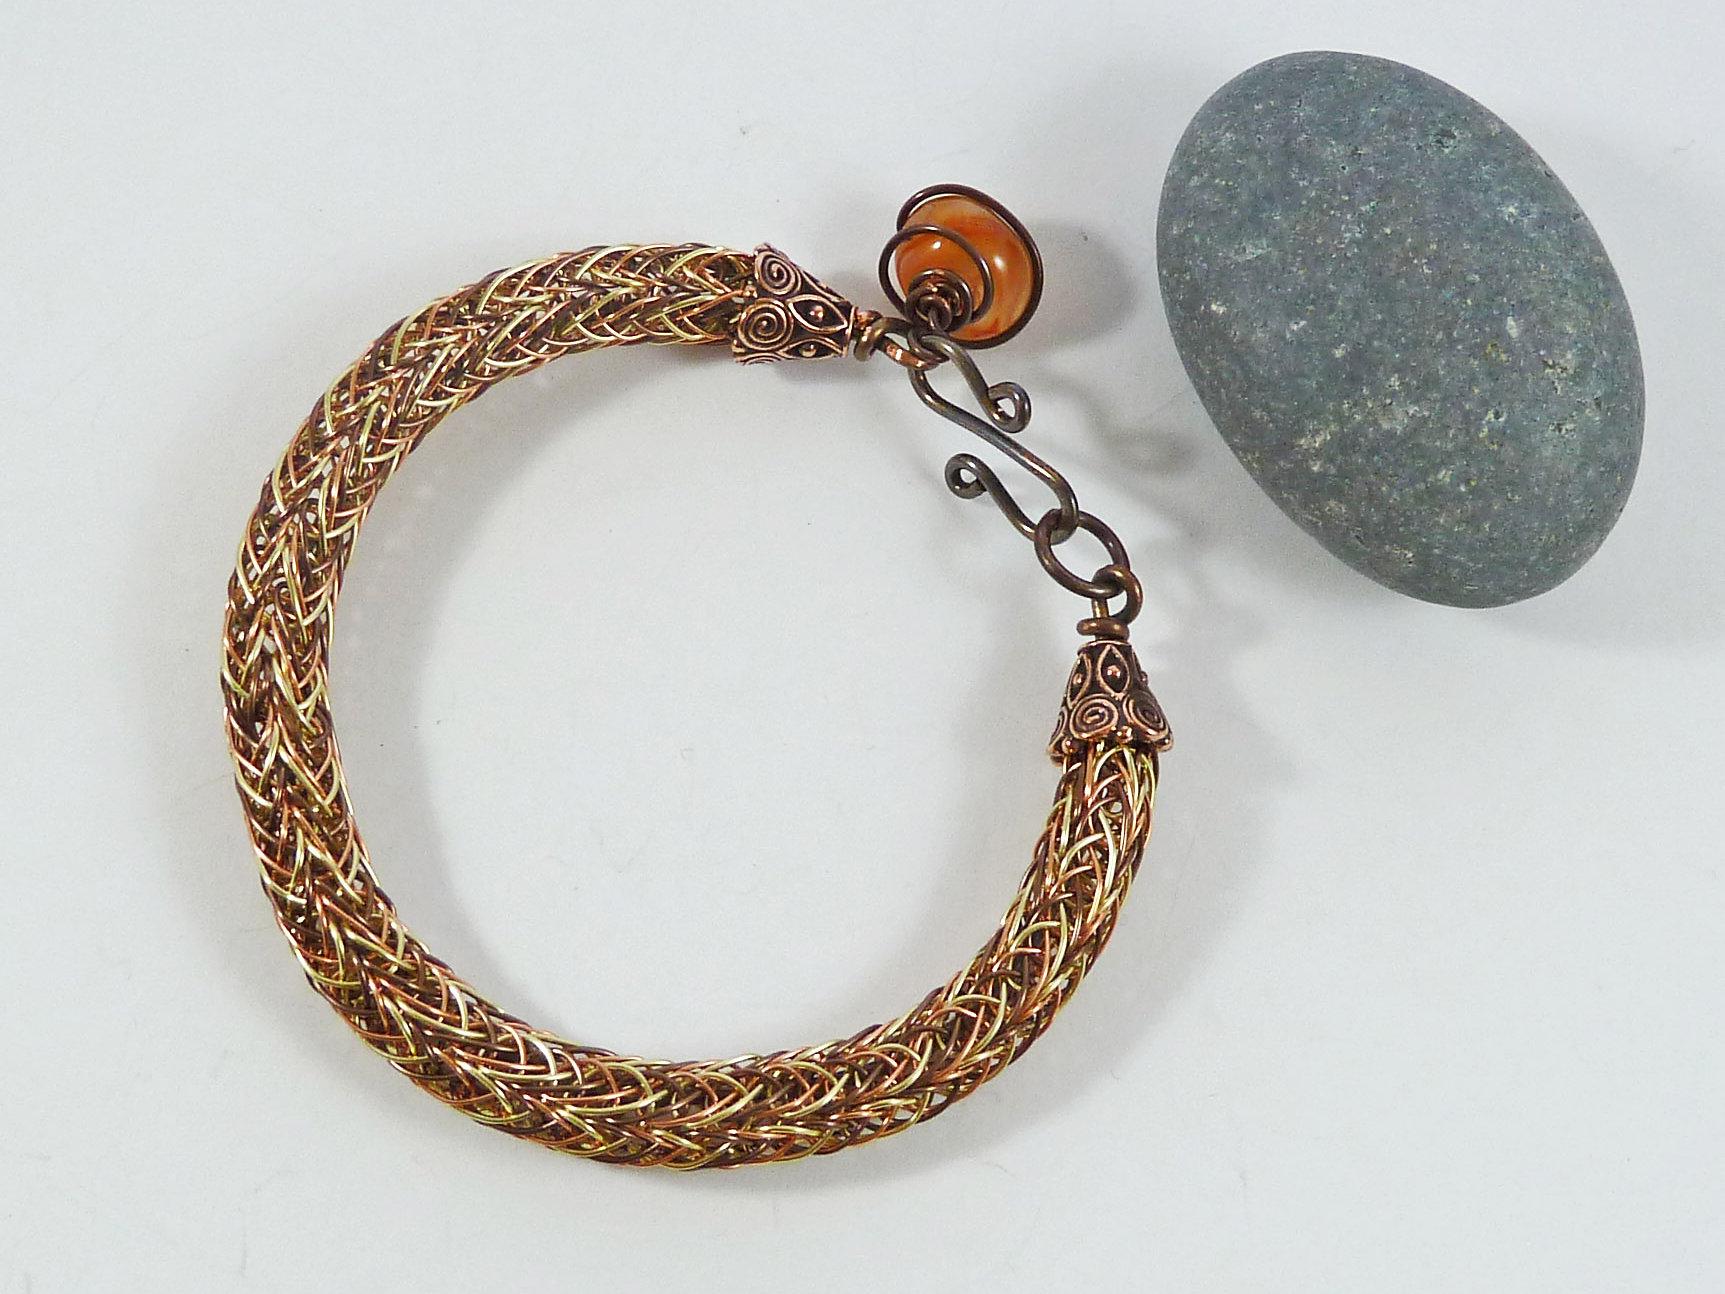 Sparkly & Colourful Handmade Jewellery, Beau Bella Jewellery ...